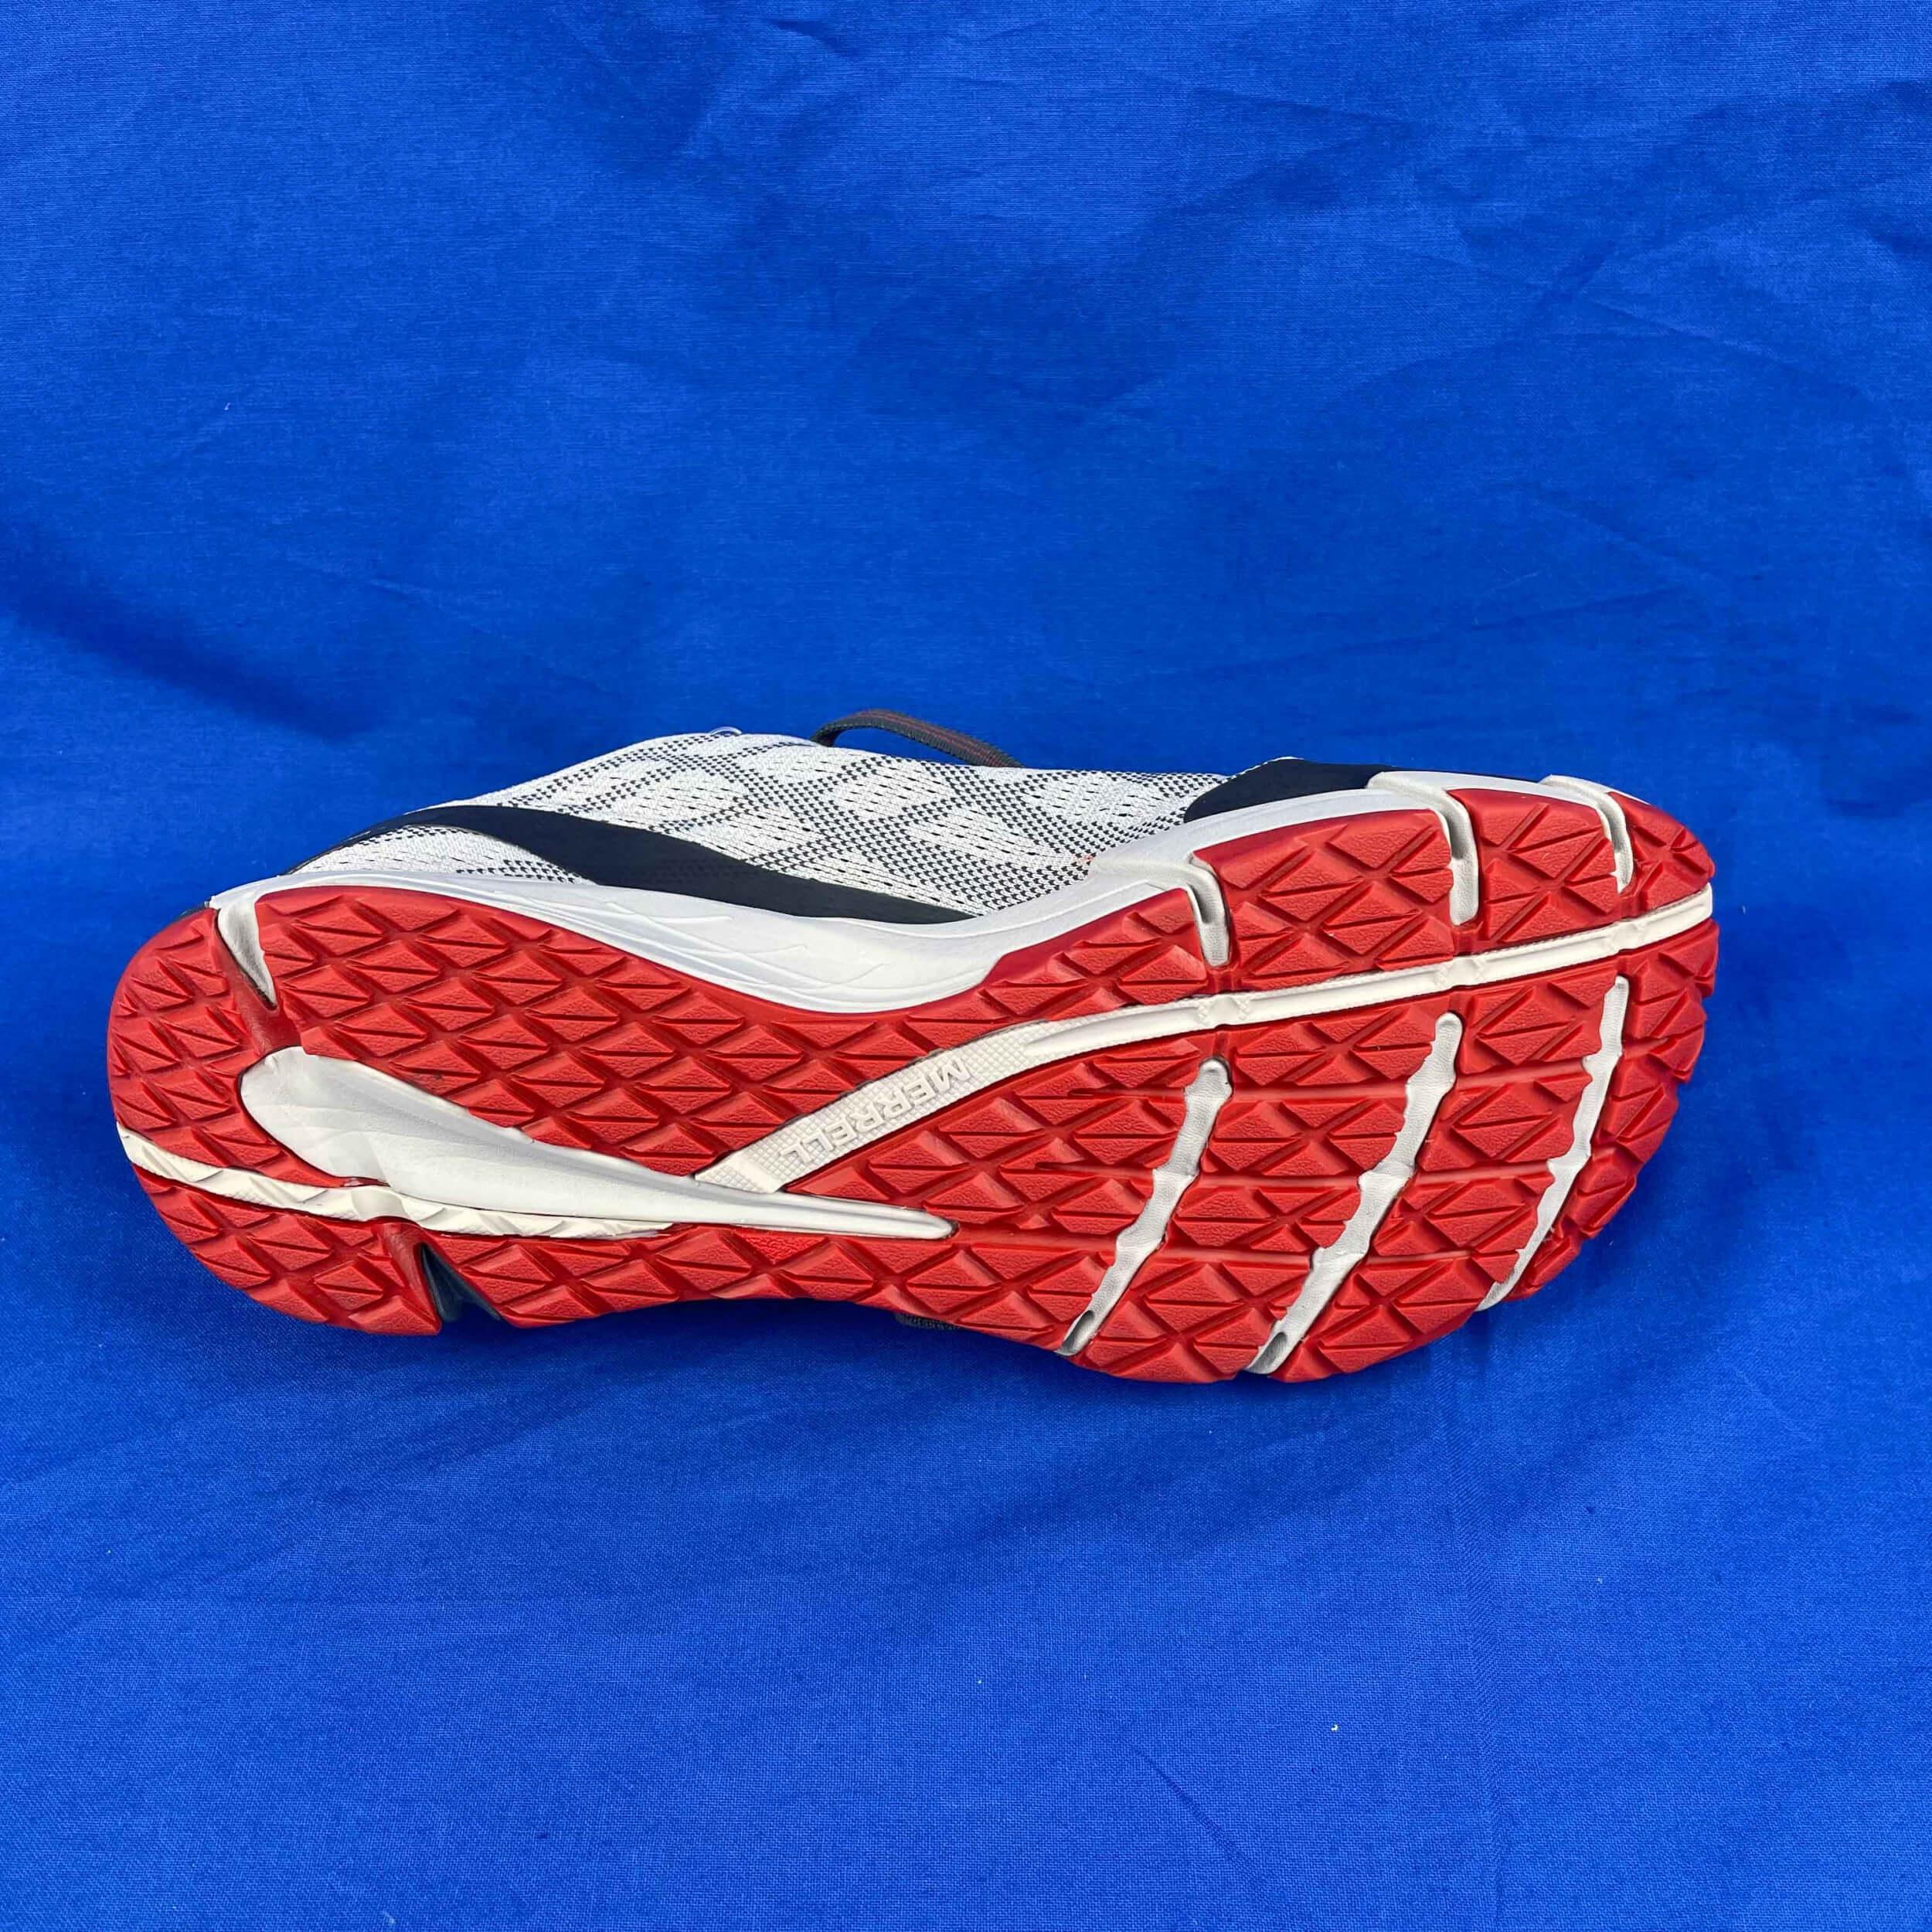 Merrell Herren Schuhe Bare Access Flex J12551 grau